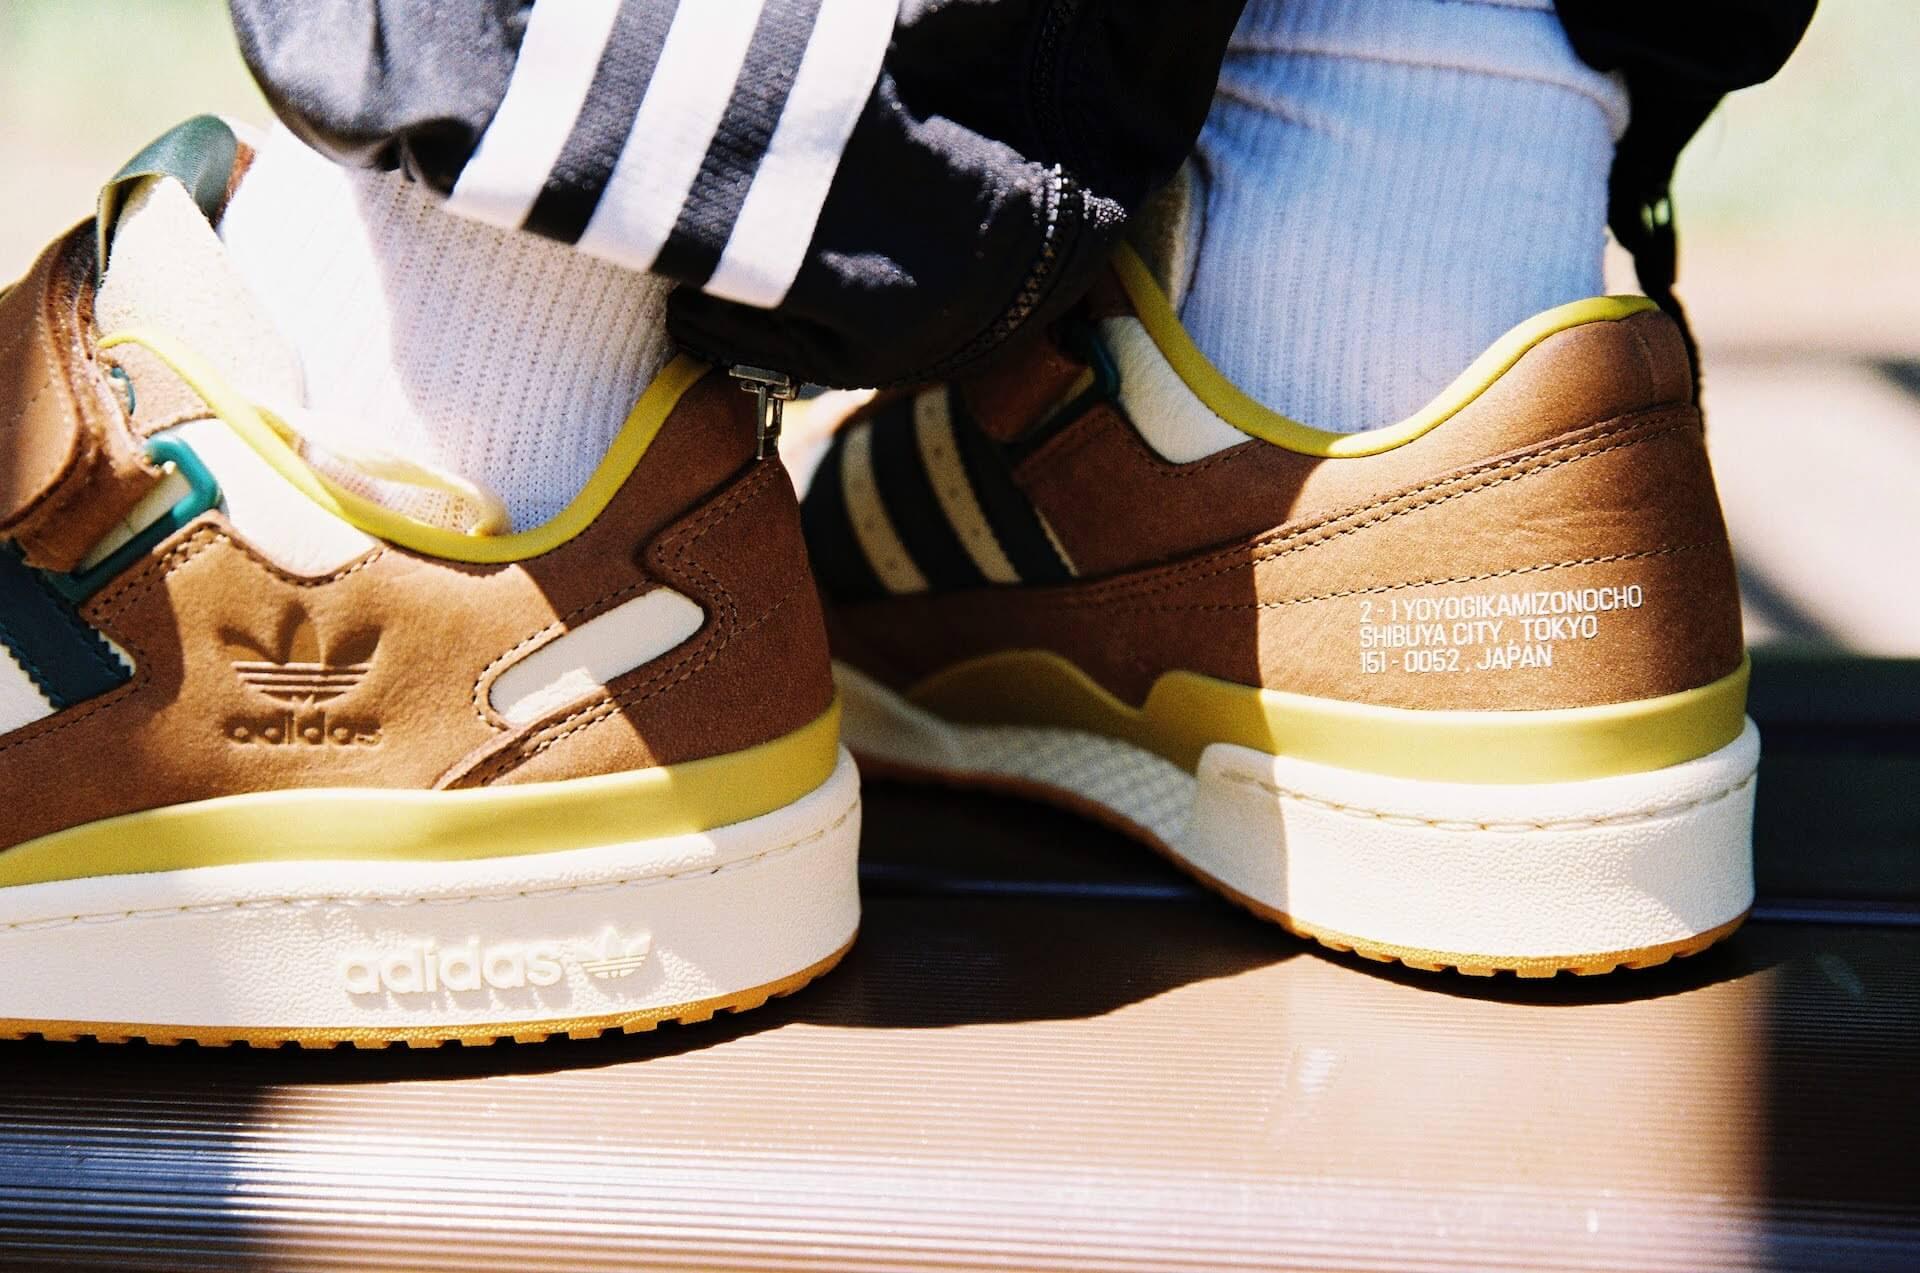 "adidas Originalsとatmosのコラボパック「""YOYOGI PARK"" PACK」が登場!代々木公園をモチーフにしたZX 8000、FORUMの2足が発売 life210802_adidasoriginals_yoyogipark_4"